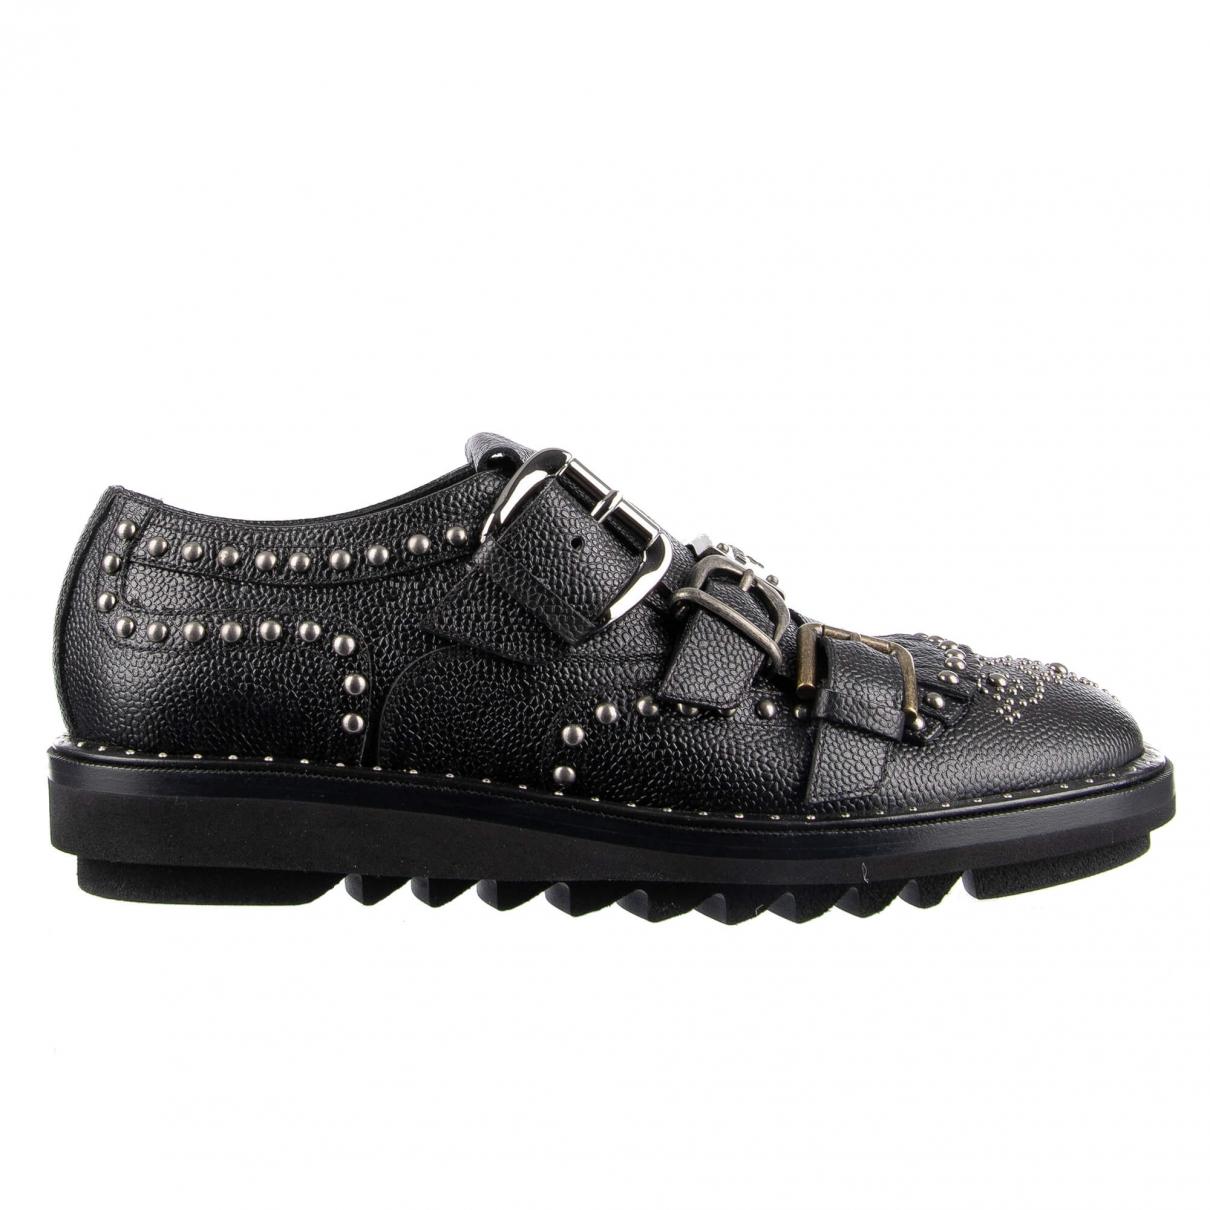 Dolce & Gabbana \N Black Leather Lace ups for Men 40 EU